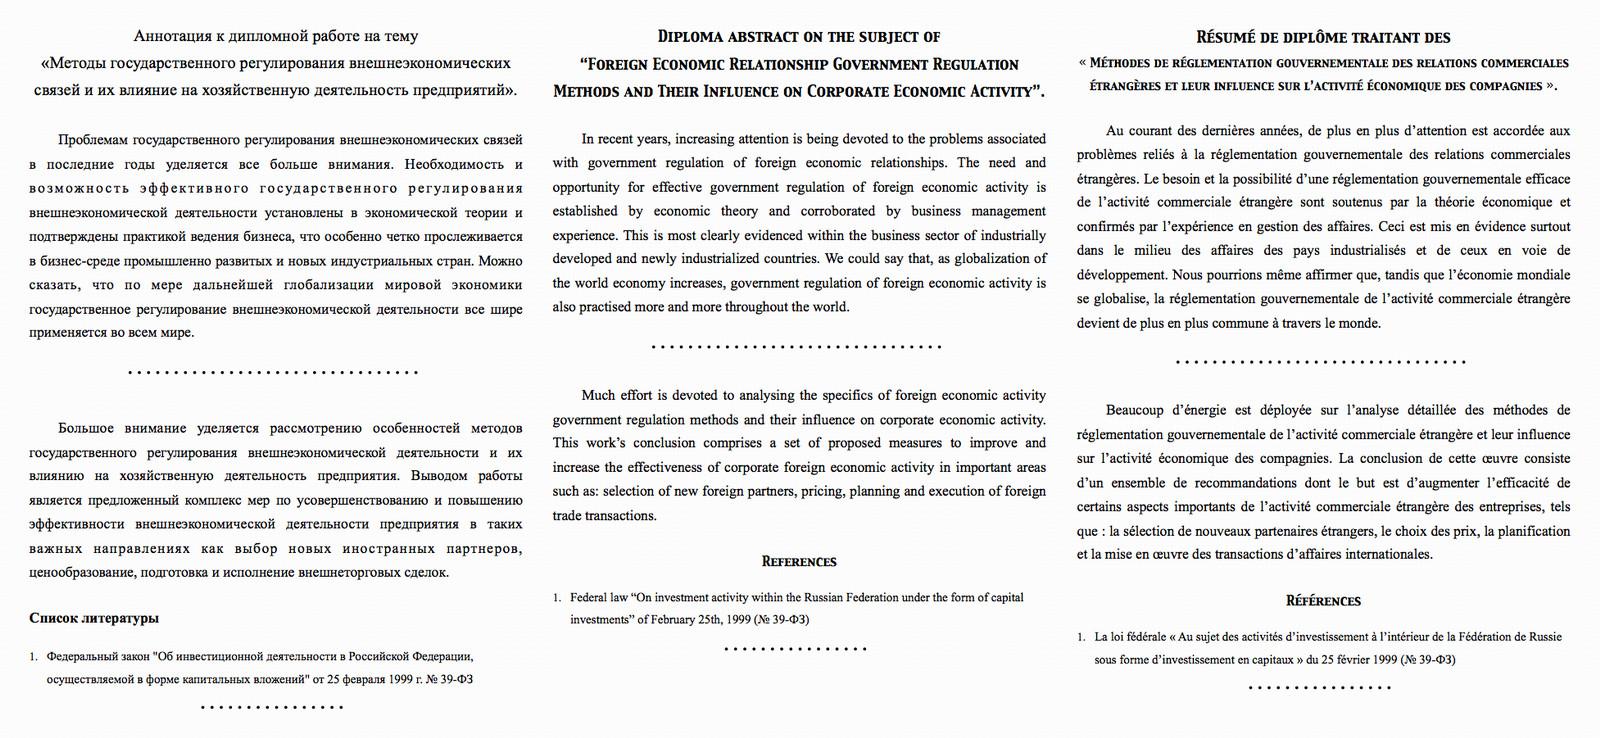 Аннотация к диплому Экономика Фрилансер Ирина Дени irina denis  Аннотация к диплому Экономика